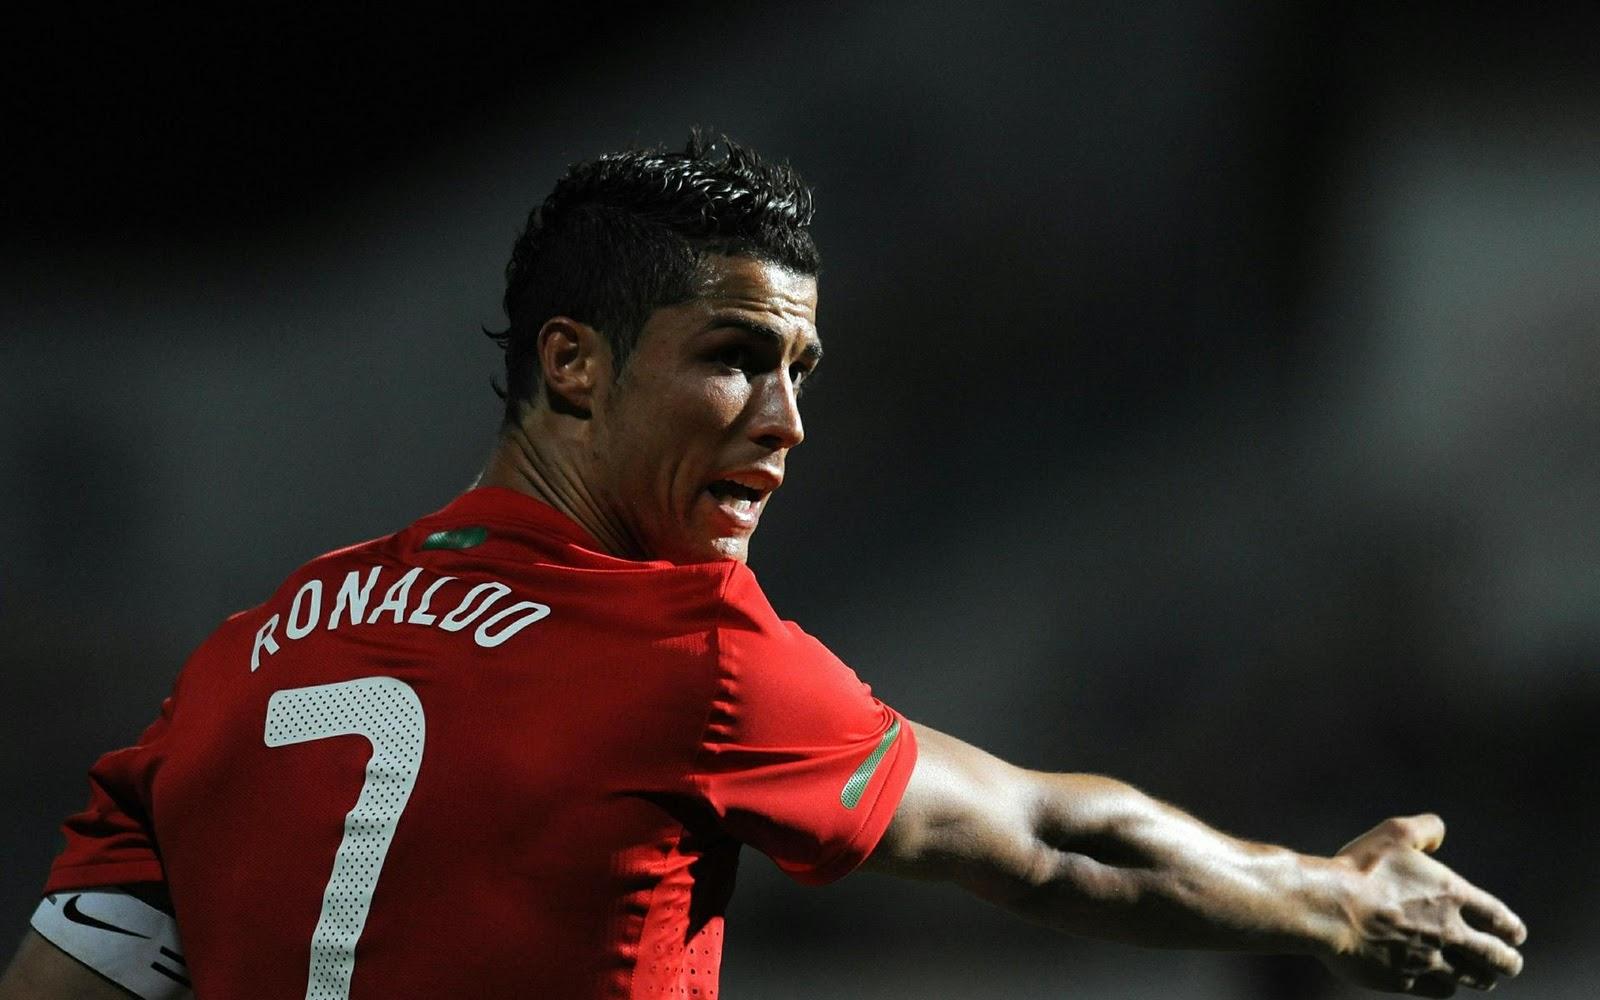 http://2.bp.blogspot.com/-GIy1Agn4n6A/TrIFoX4if9I/AAAAAAAAEEE/QqzJ71OHzVM/s1600/Cristiano+Ronaldo+HD+Wallpaper3.jpg